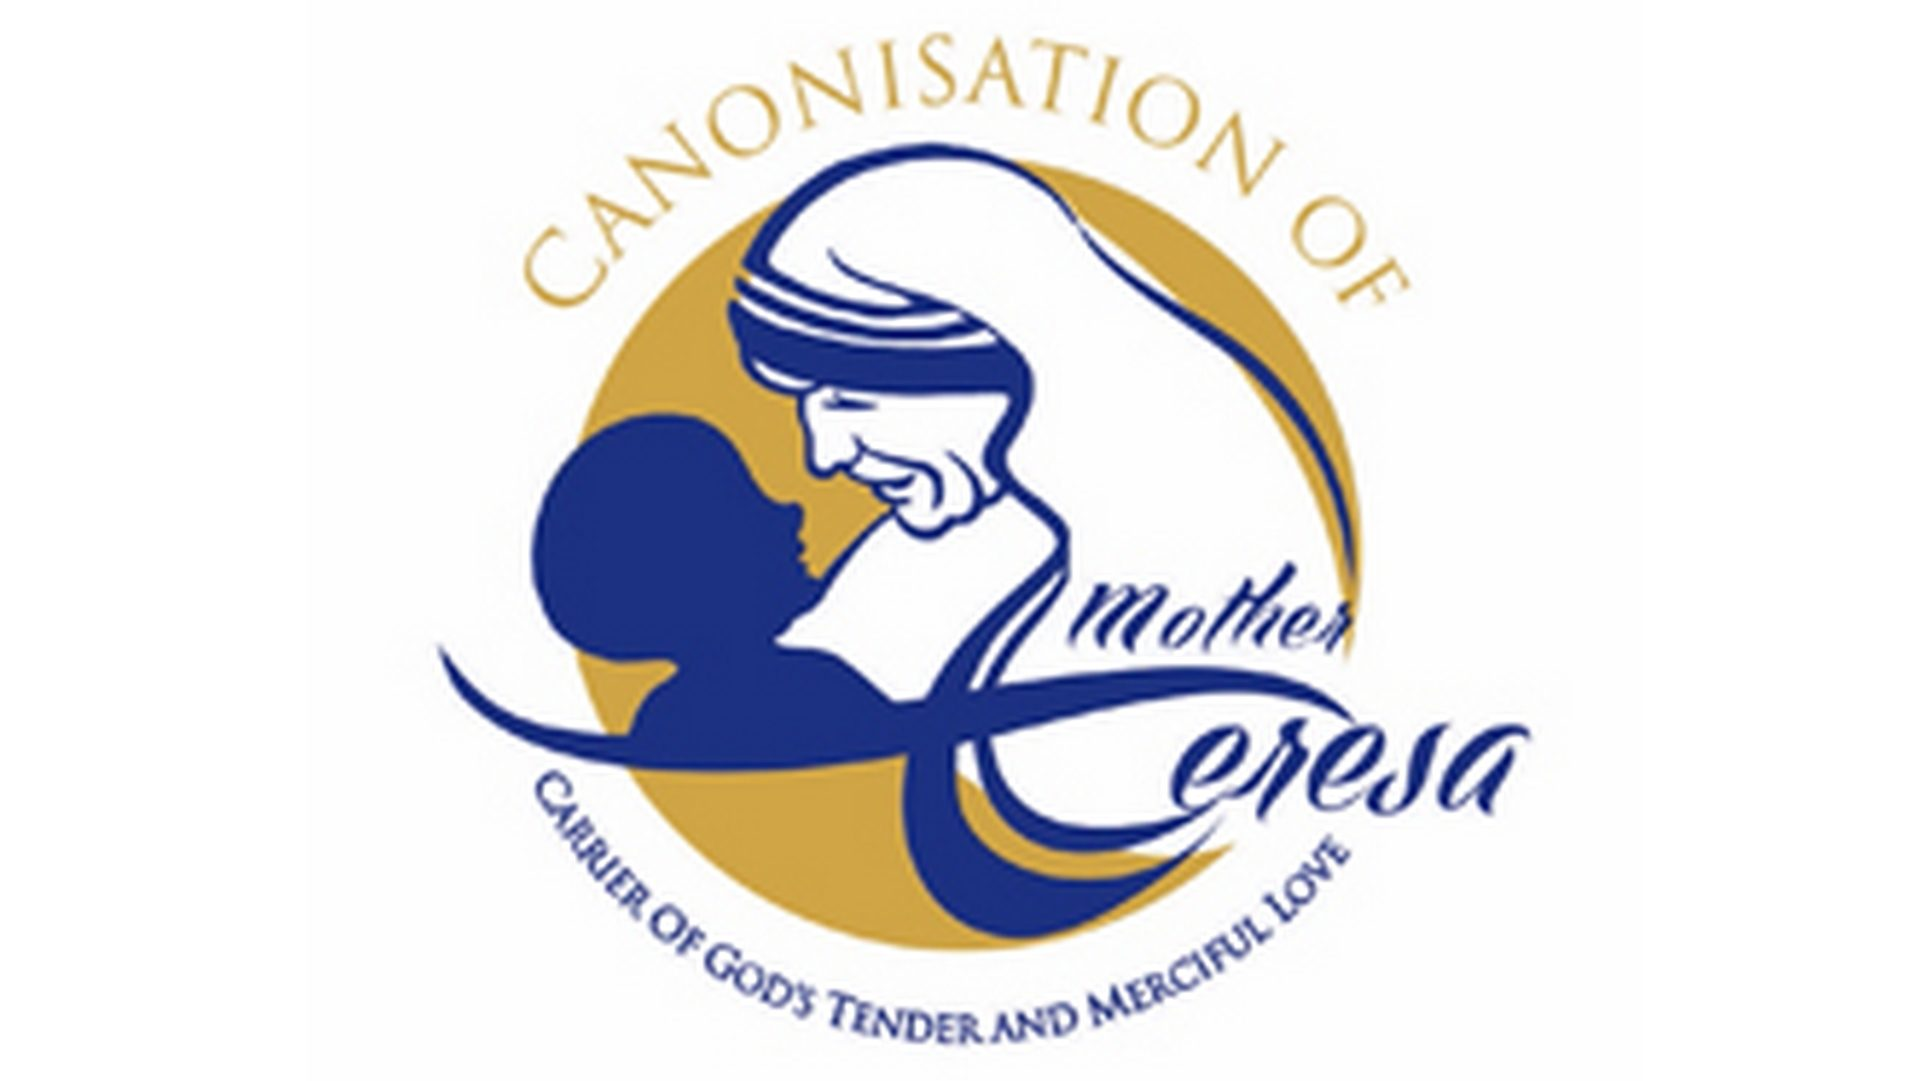 Logo de la canonisation de Mère Teresa